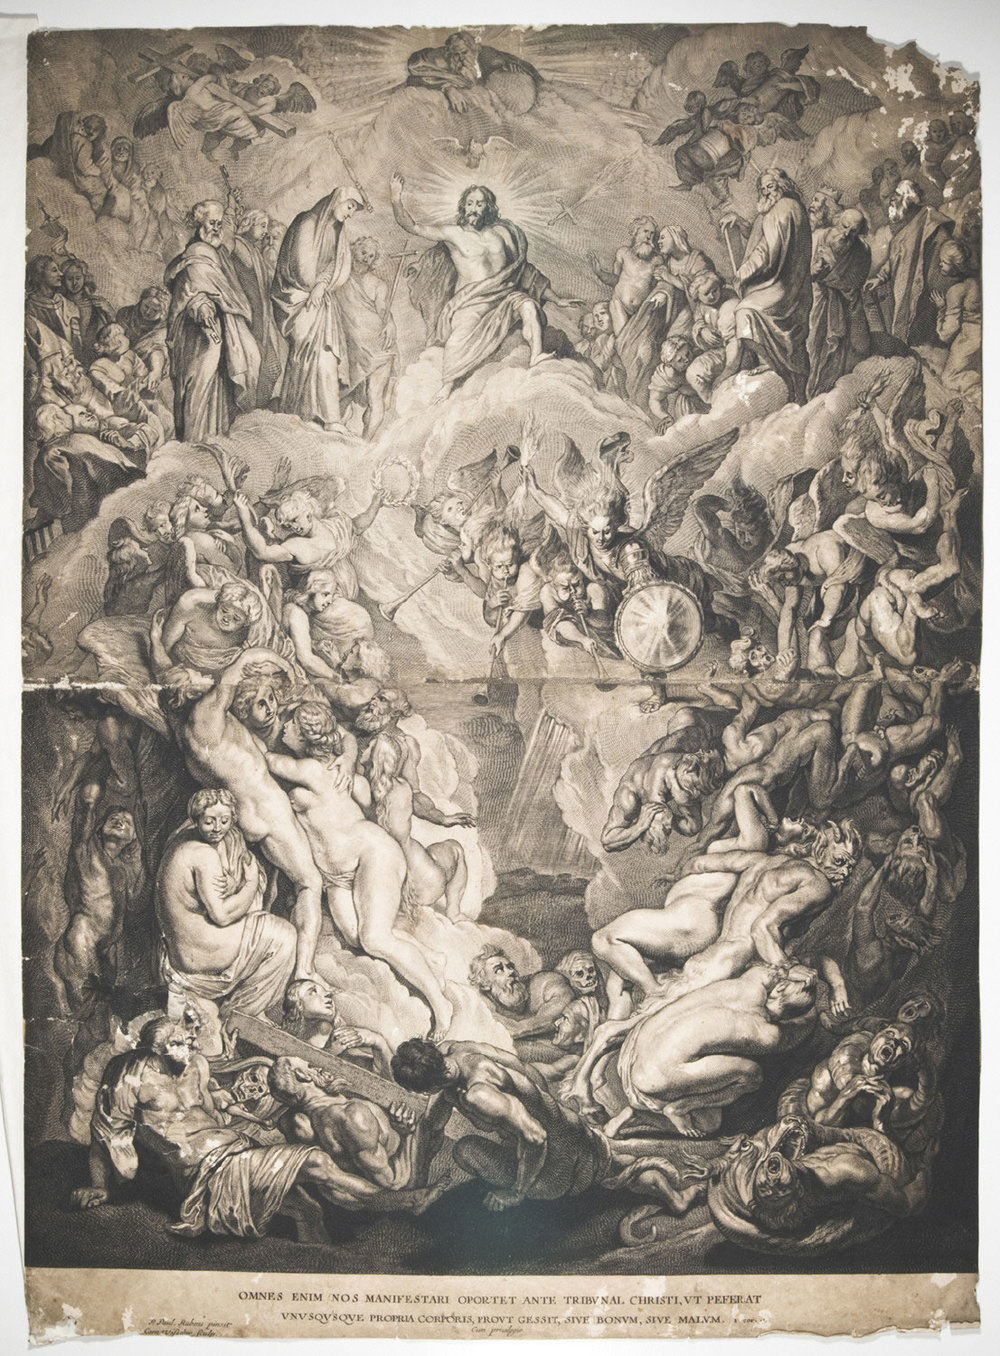 The Last Judgement  , Mid- 17th century, by Cornelis de Visscher, Dutch, from the  Philadelphia Museum of Art